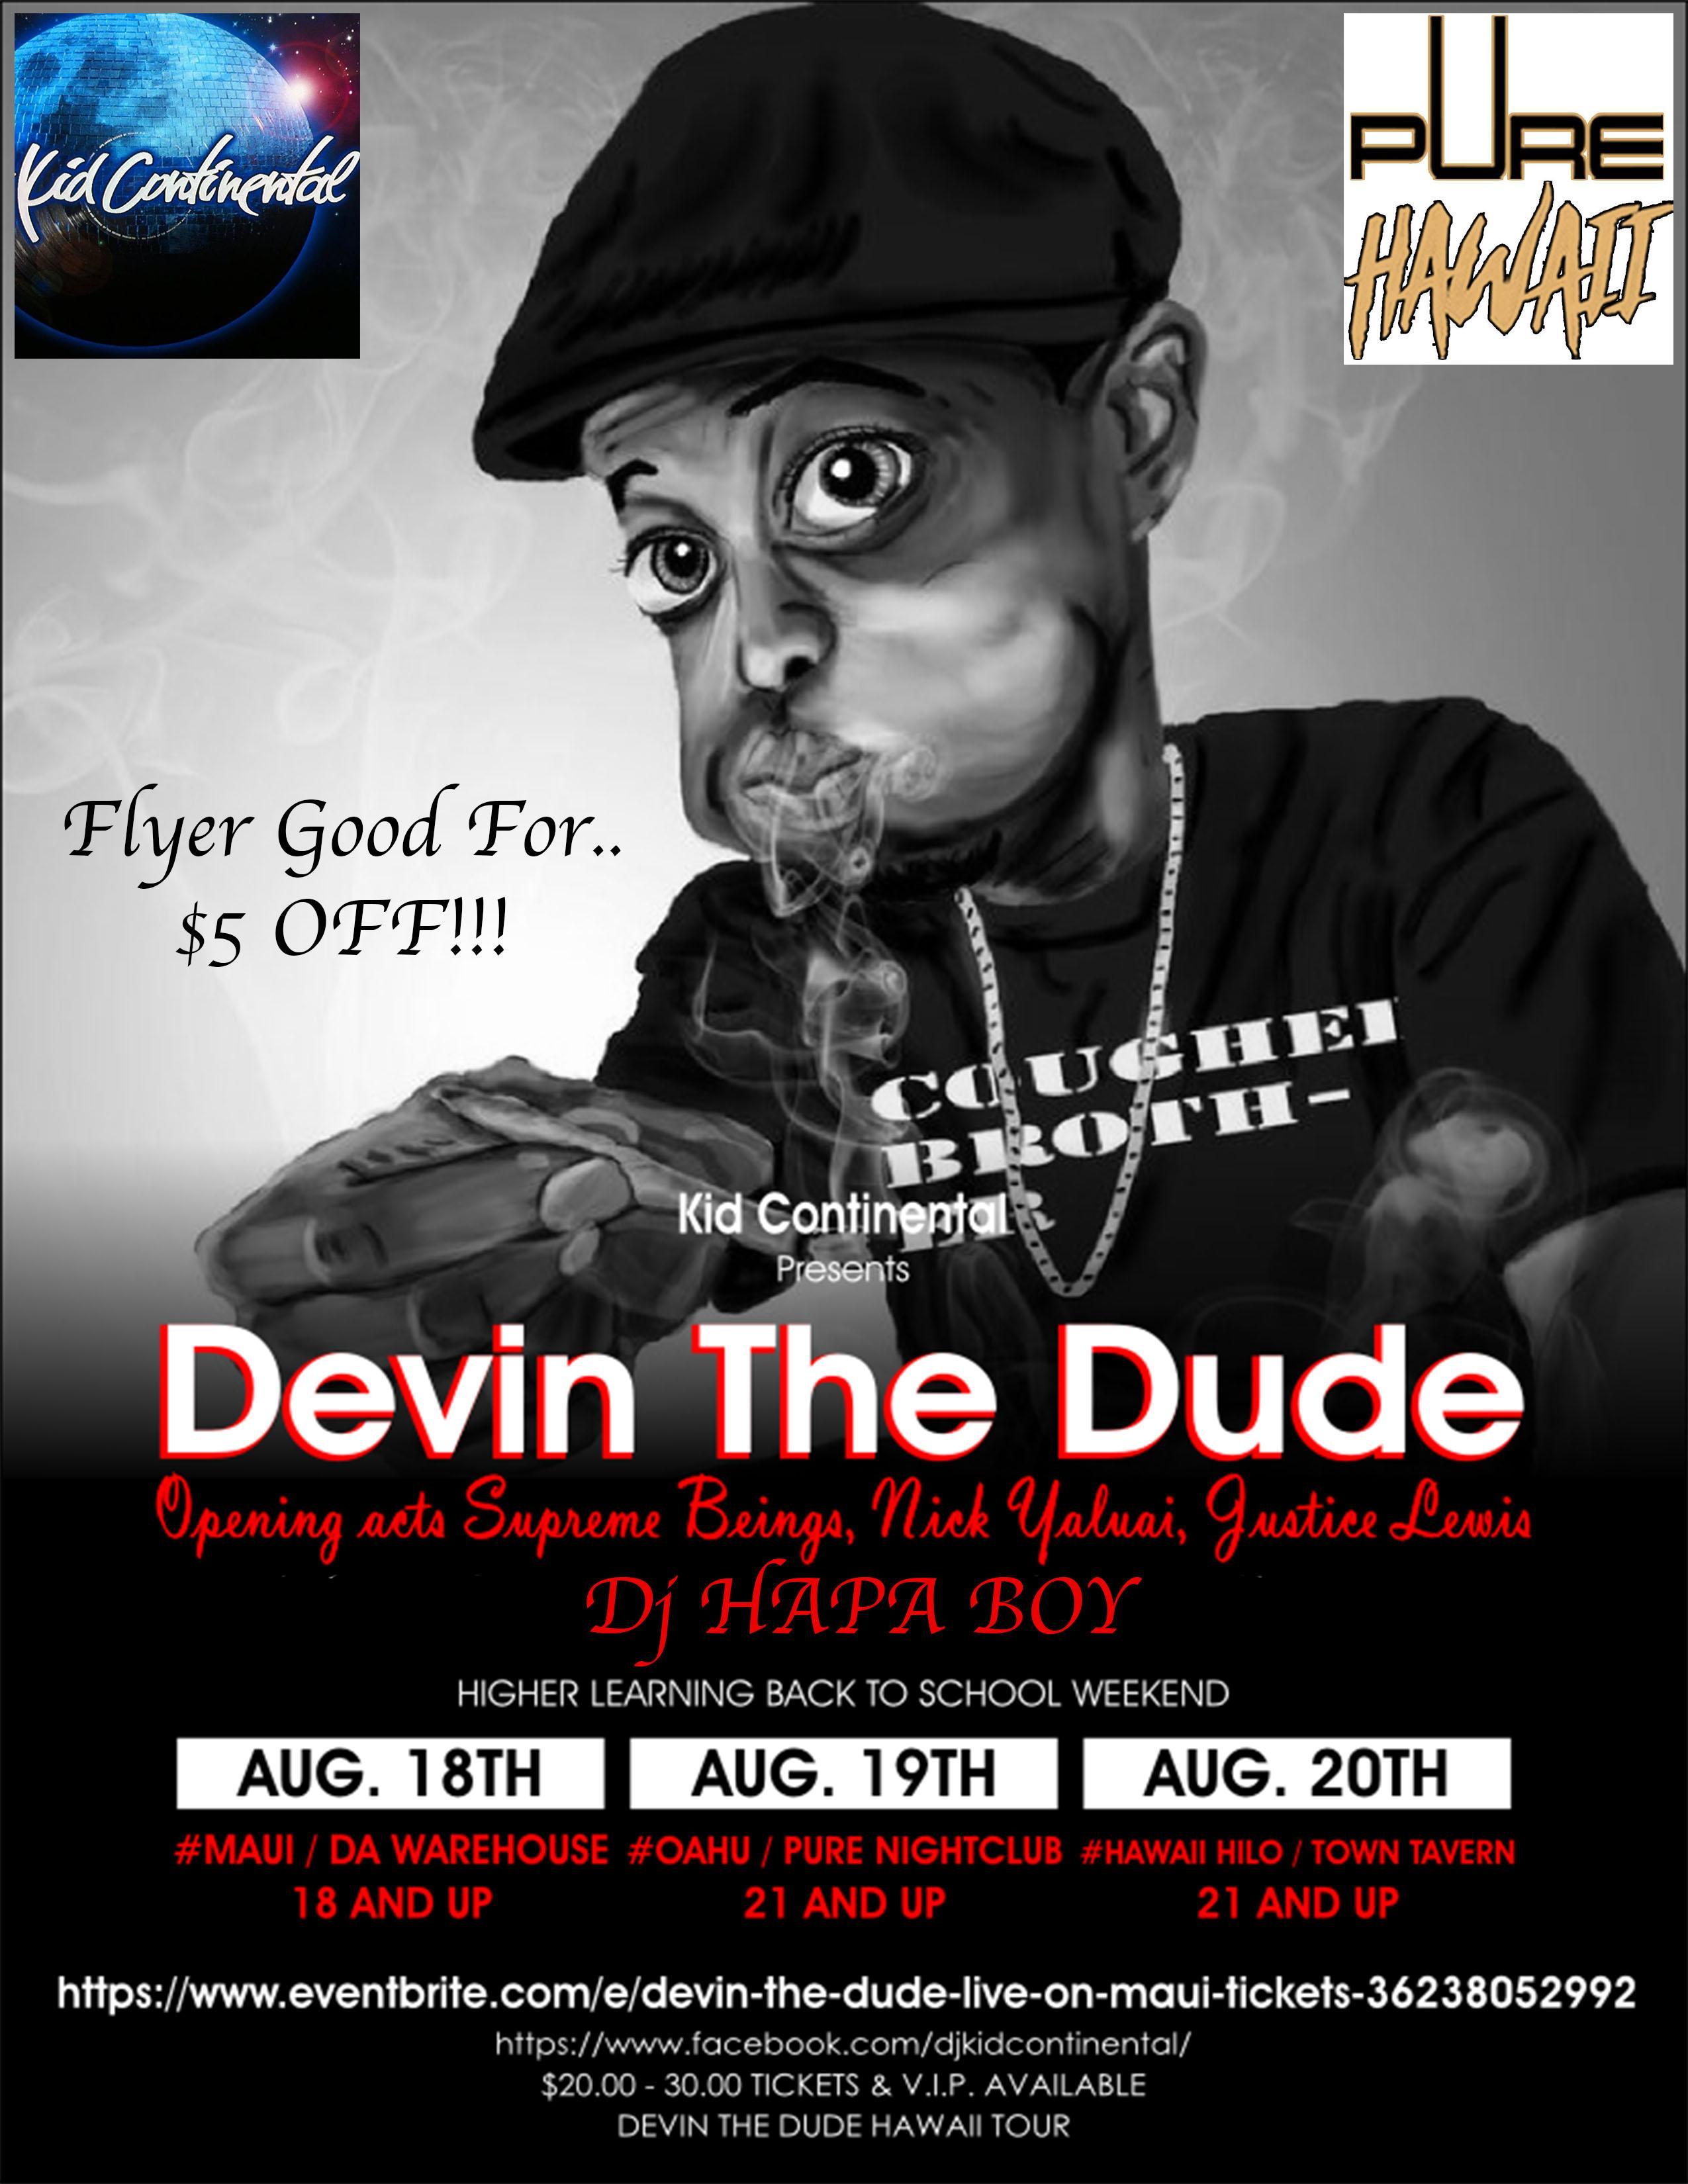 Devin the Dude Live in Honolulu